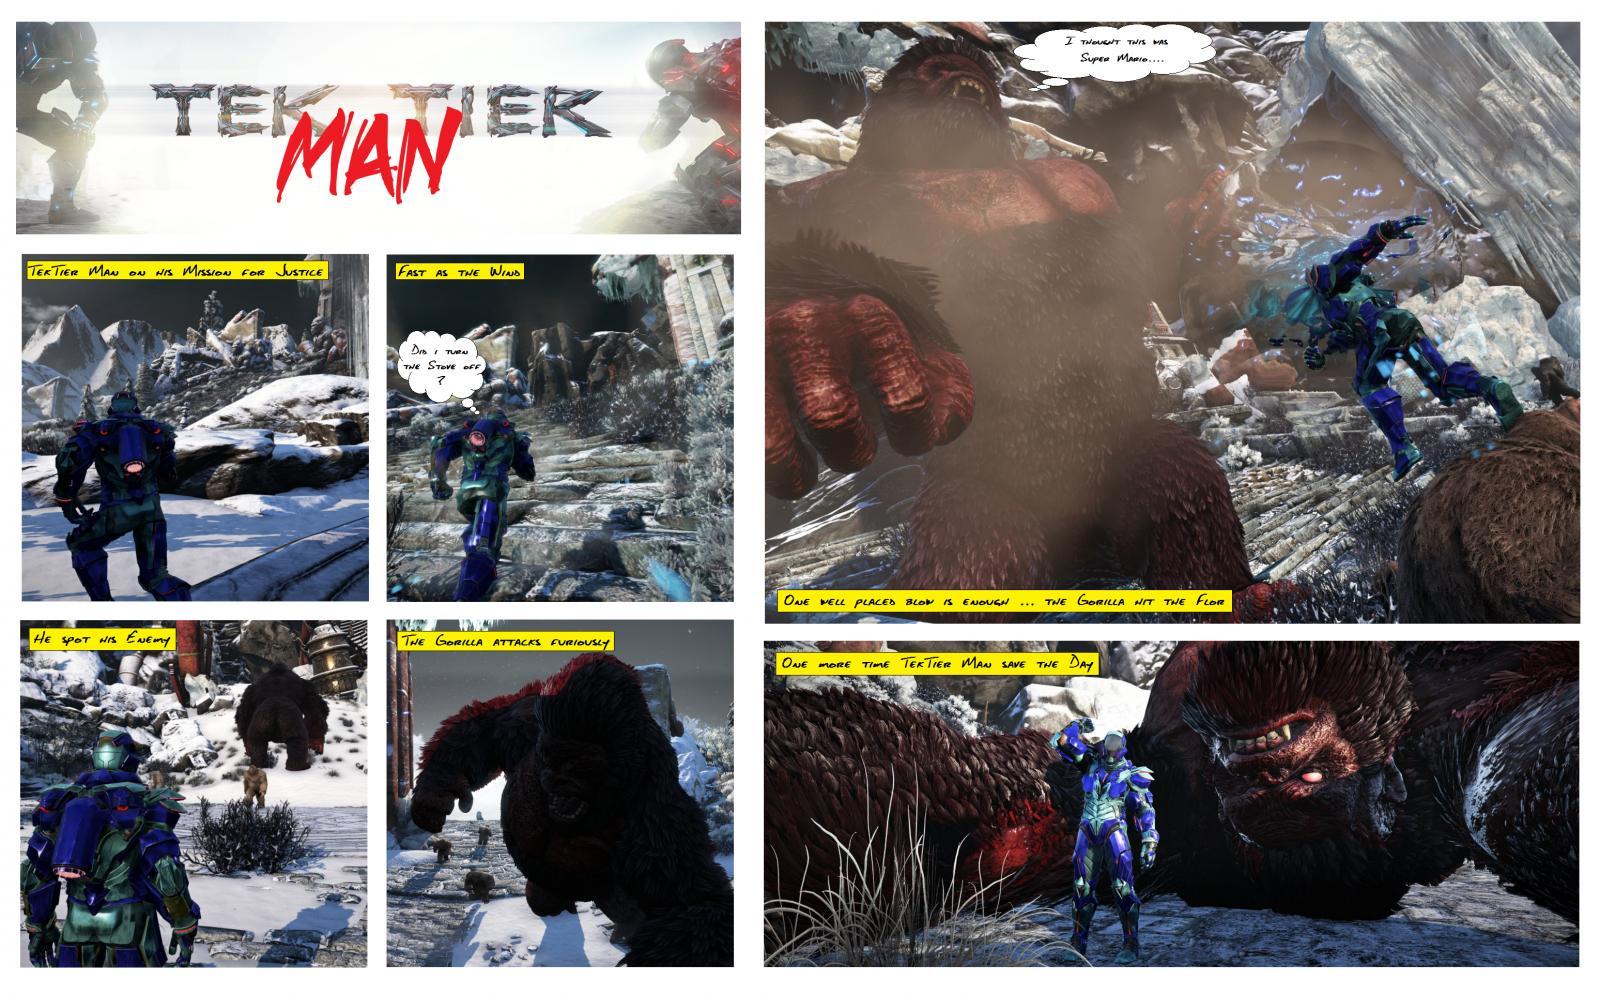 589e970926966_large.Exilog_-_TekTier_Mans_Adventure_sta.jpg